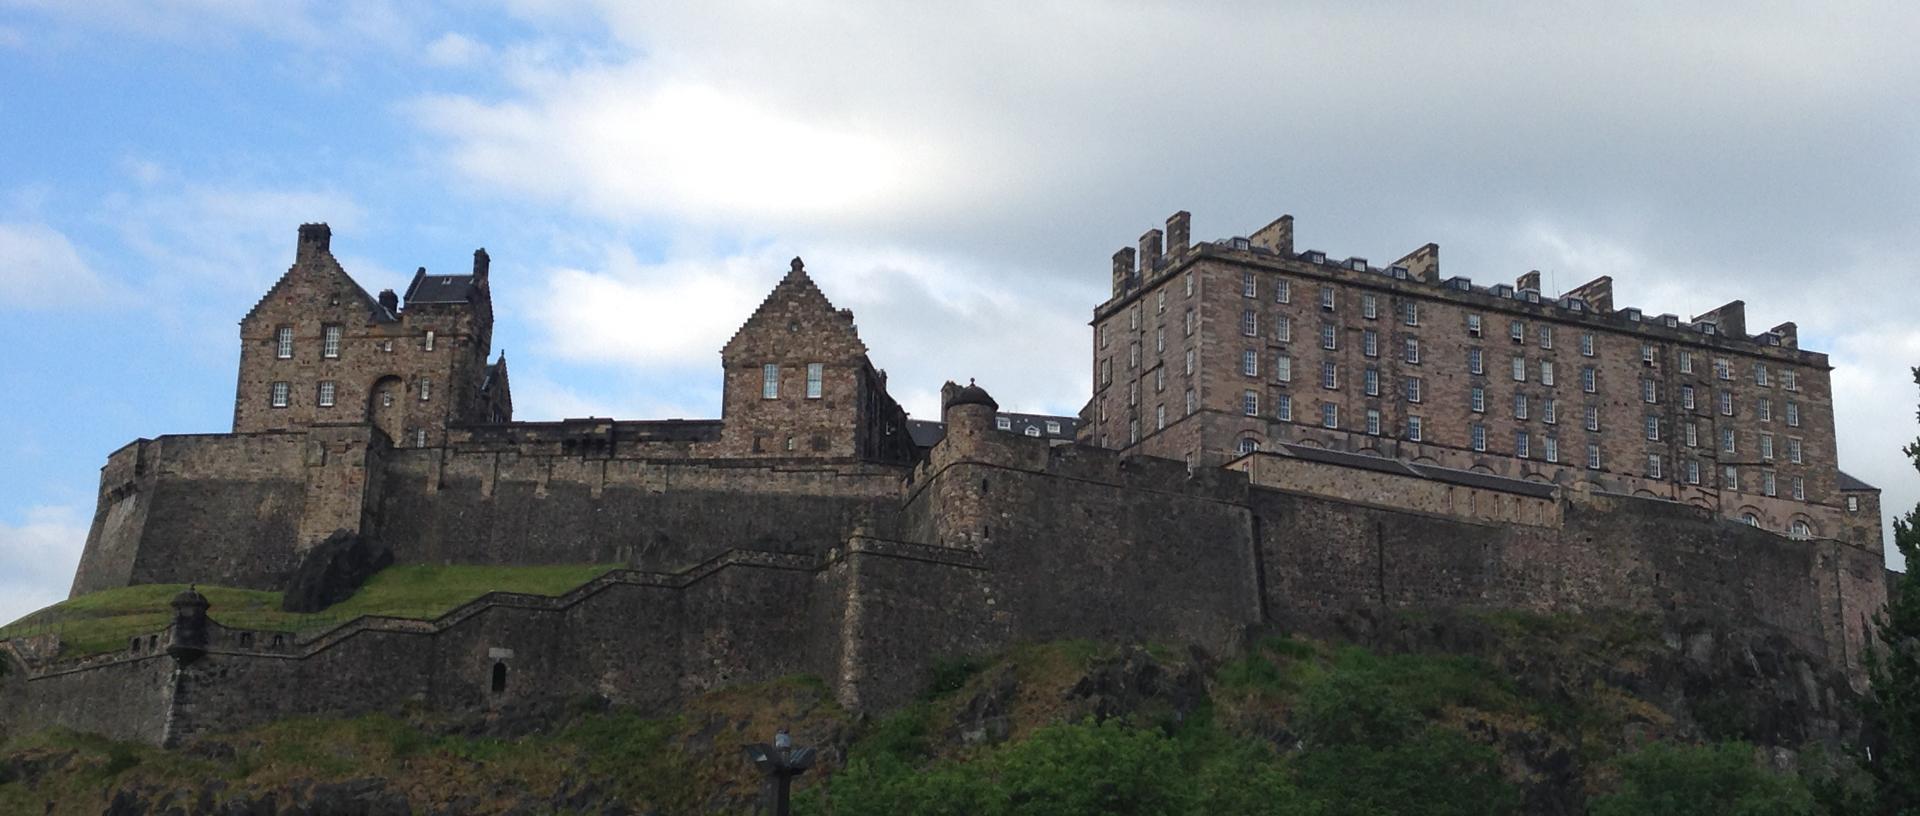 Overlooking the 2015 EIFF stoodthe beautiful Edinburgh Castle.